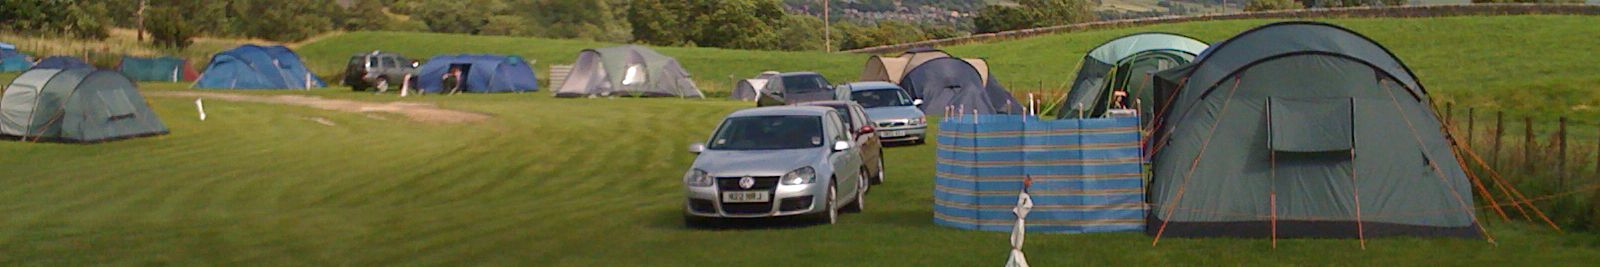 strip campsite